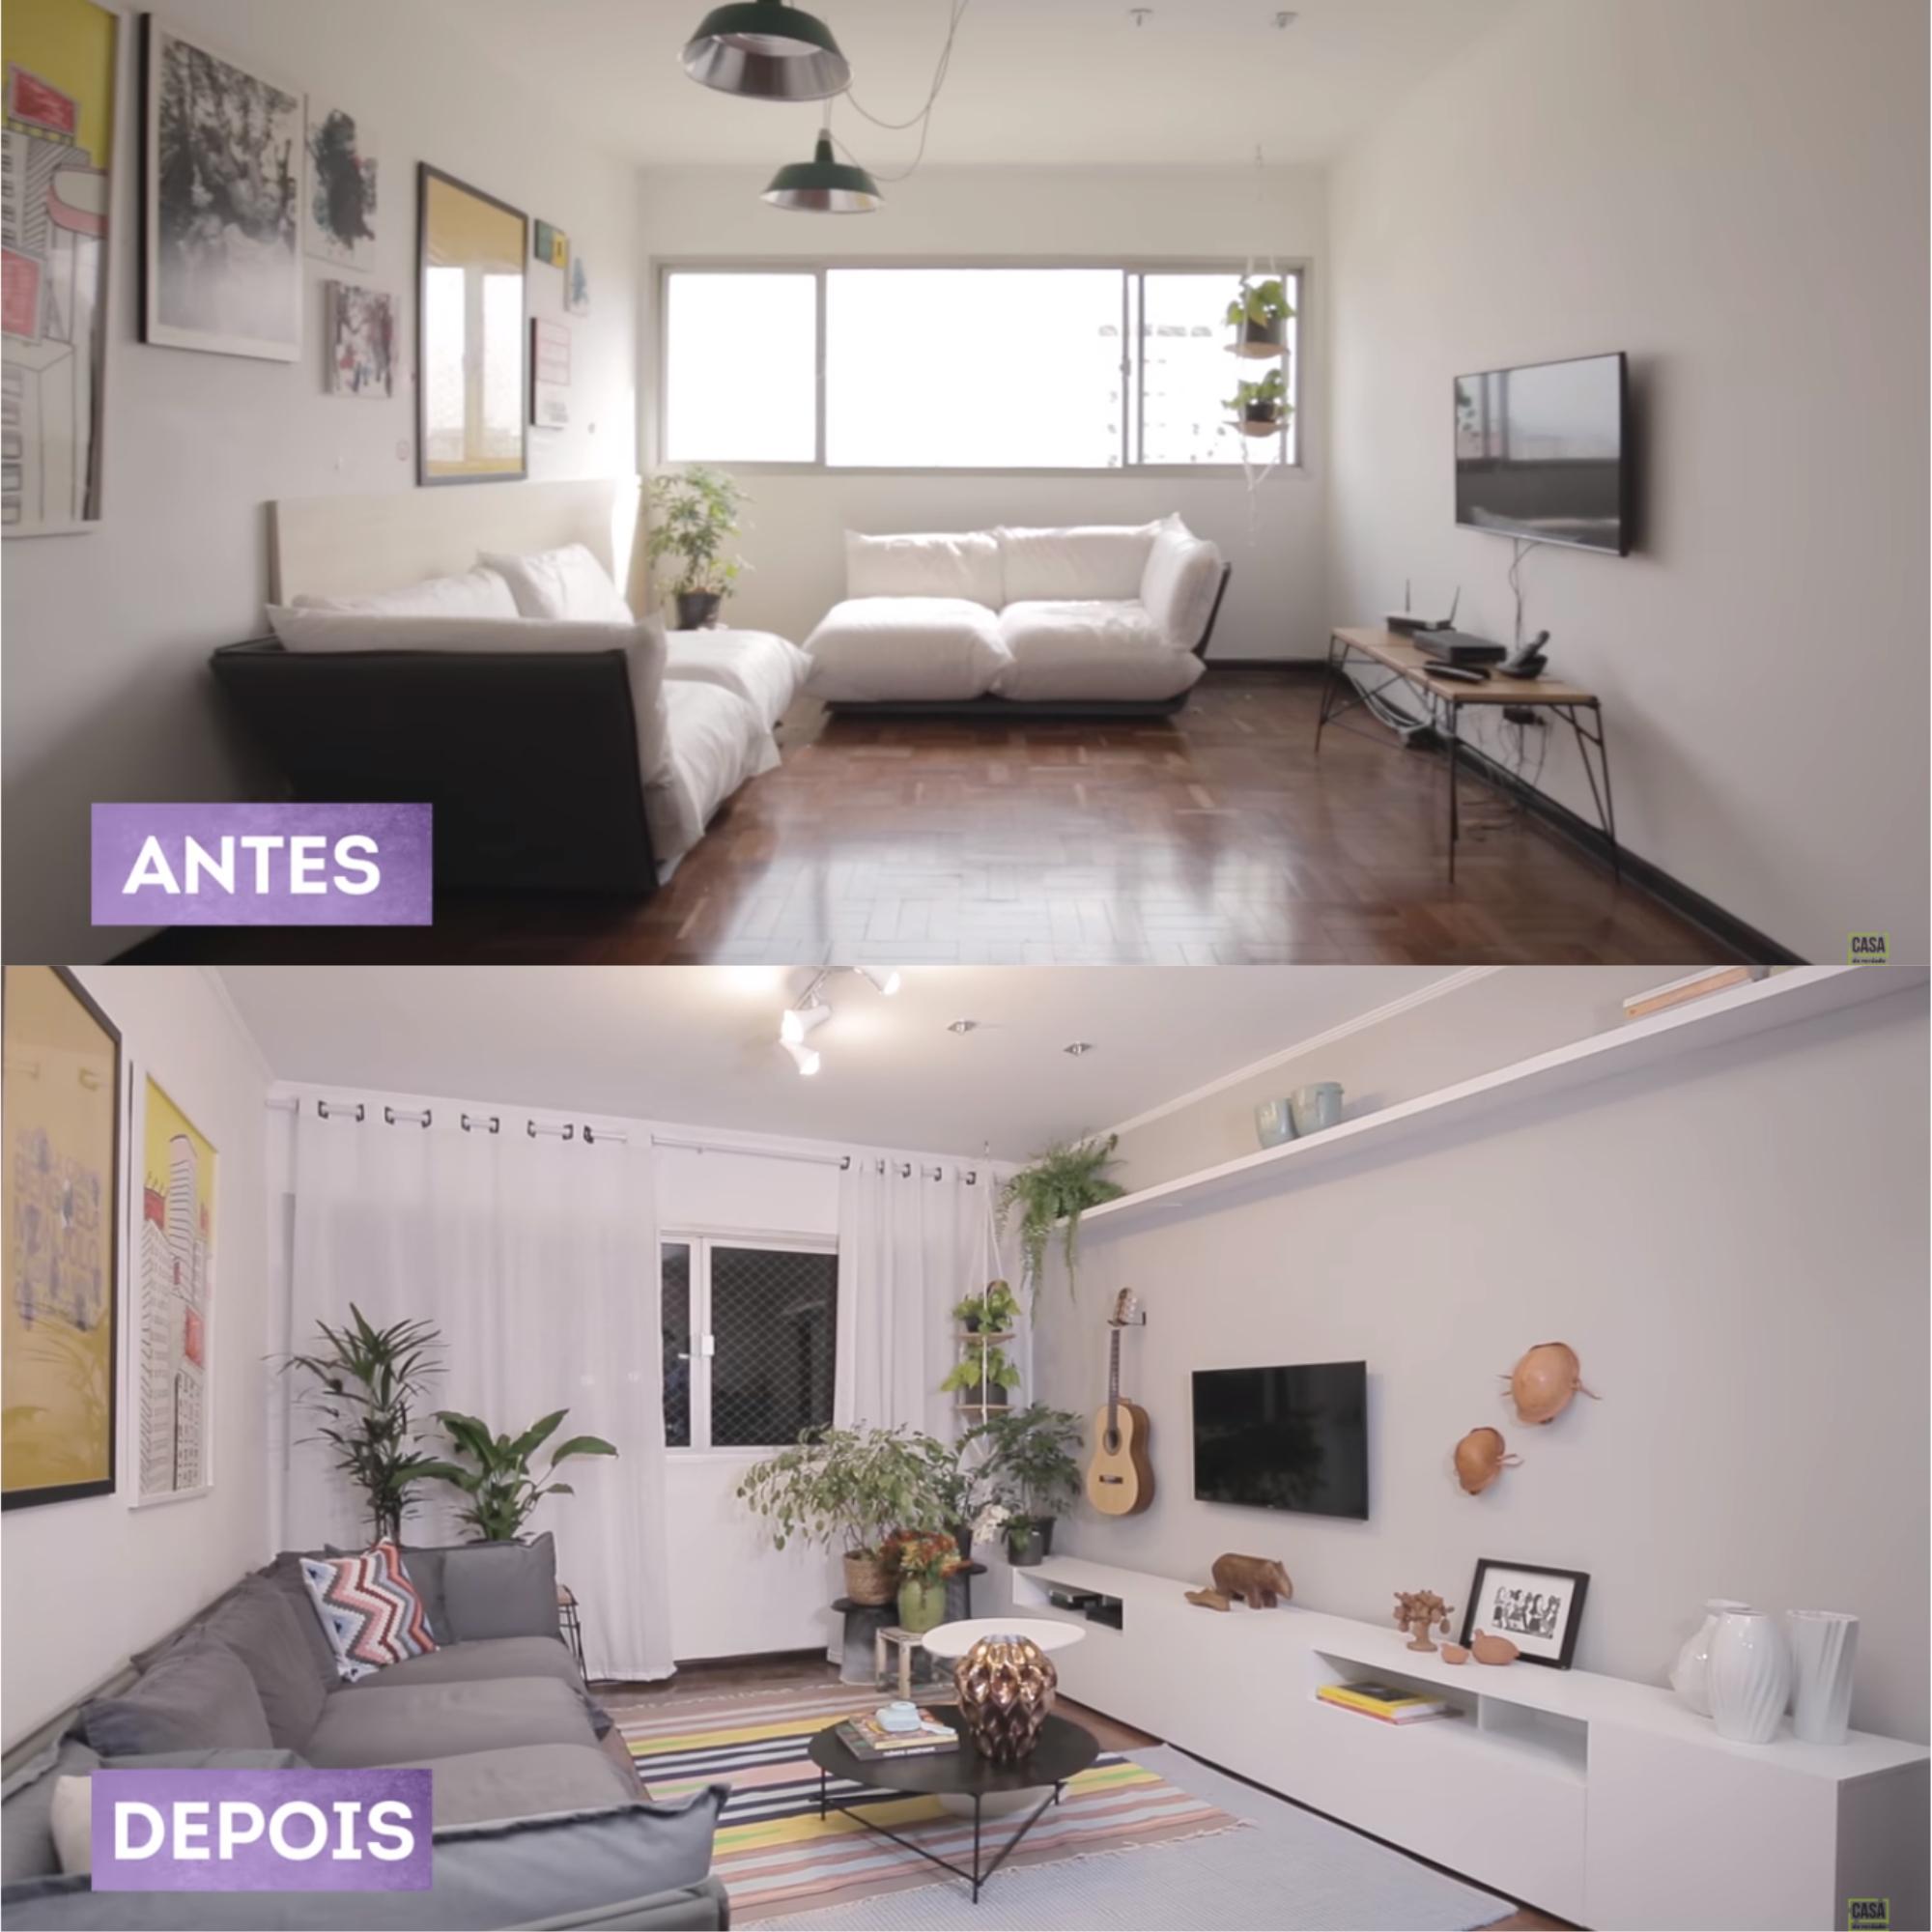 Antes e depois de 20 ambientes transformados pela leroy merlin for Tappeti sala leroy merlin